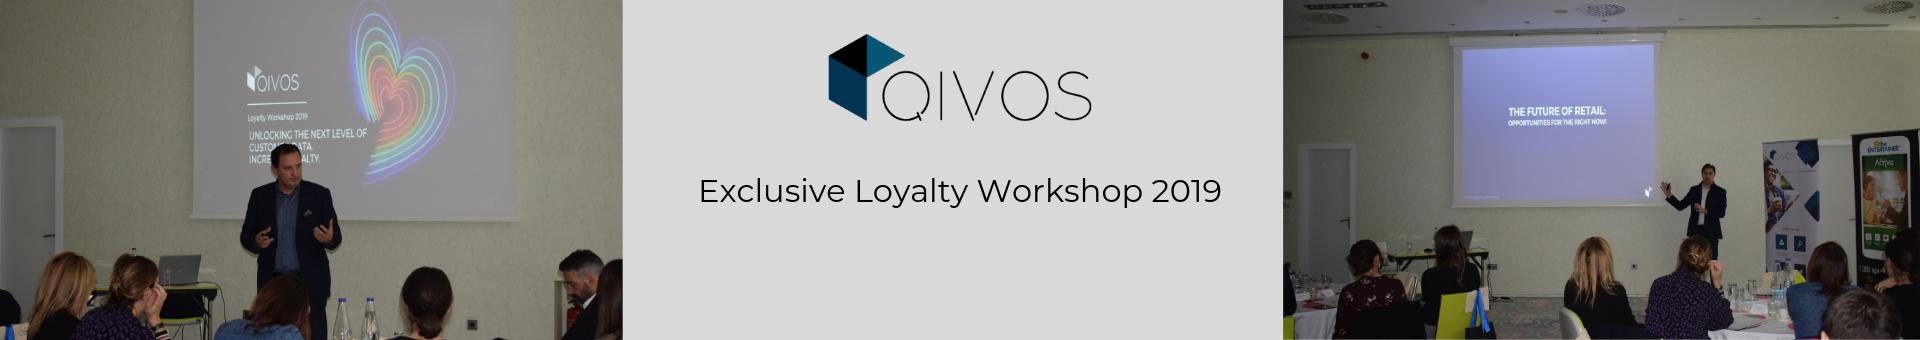 QIVOS LOYALTY WORKSHOP 2019